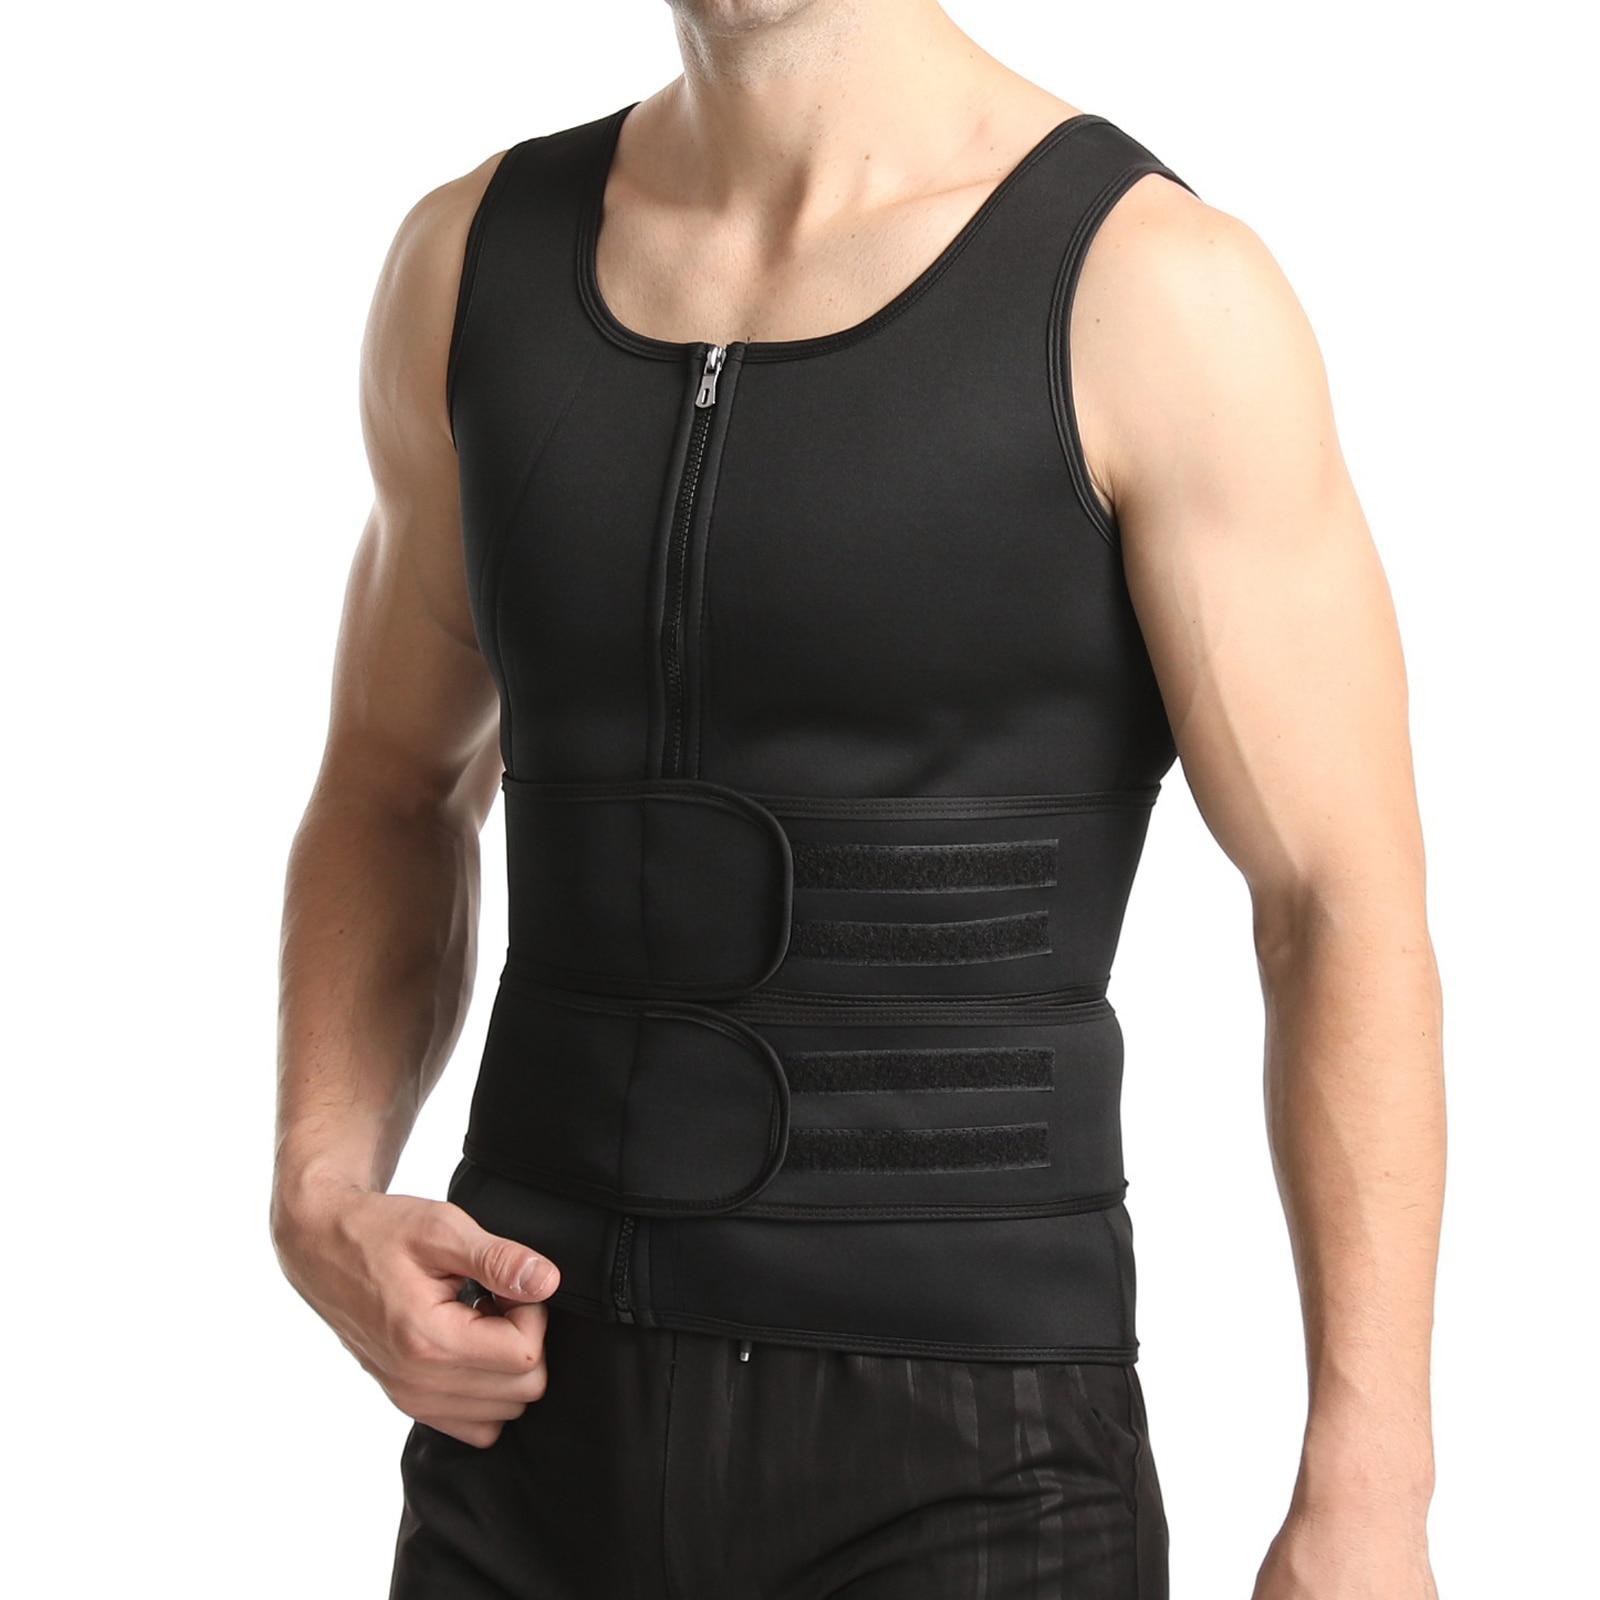 Men Neoprene Sauna Sweat Vest Workout Waist Trainer Slimming Shirt Fitness Tank Top Fat Burner for Weight Loss Corsets